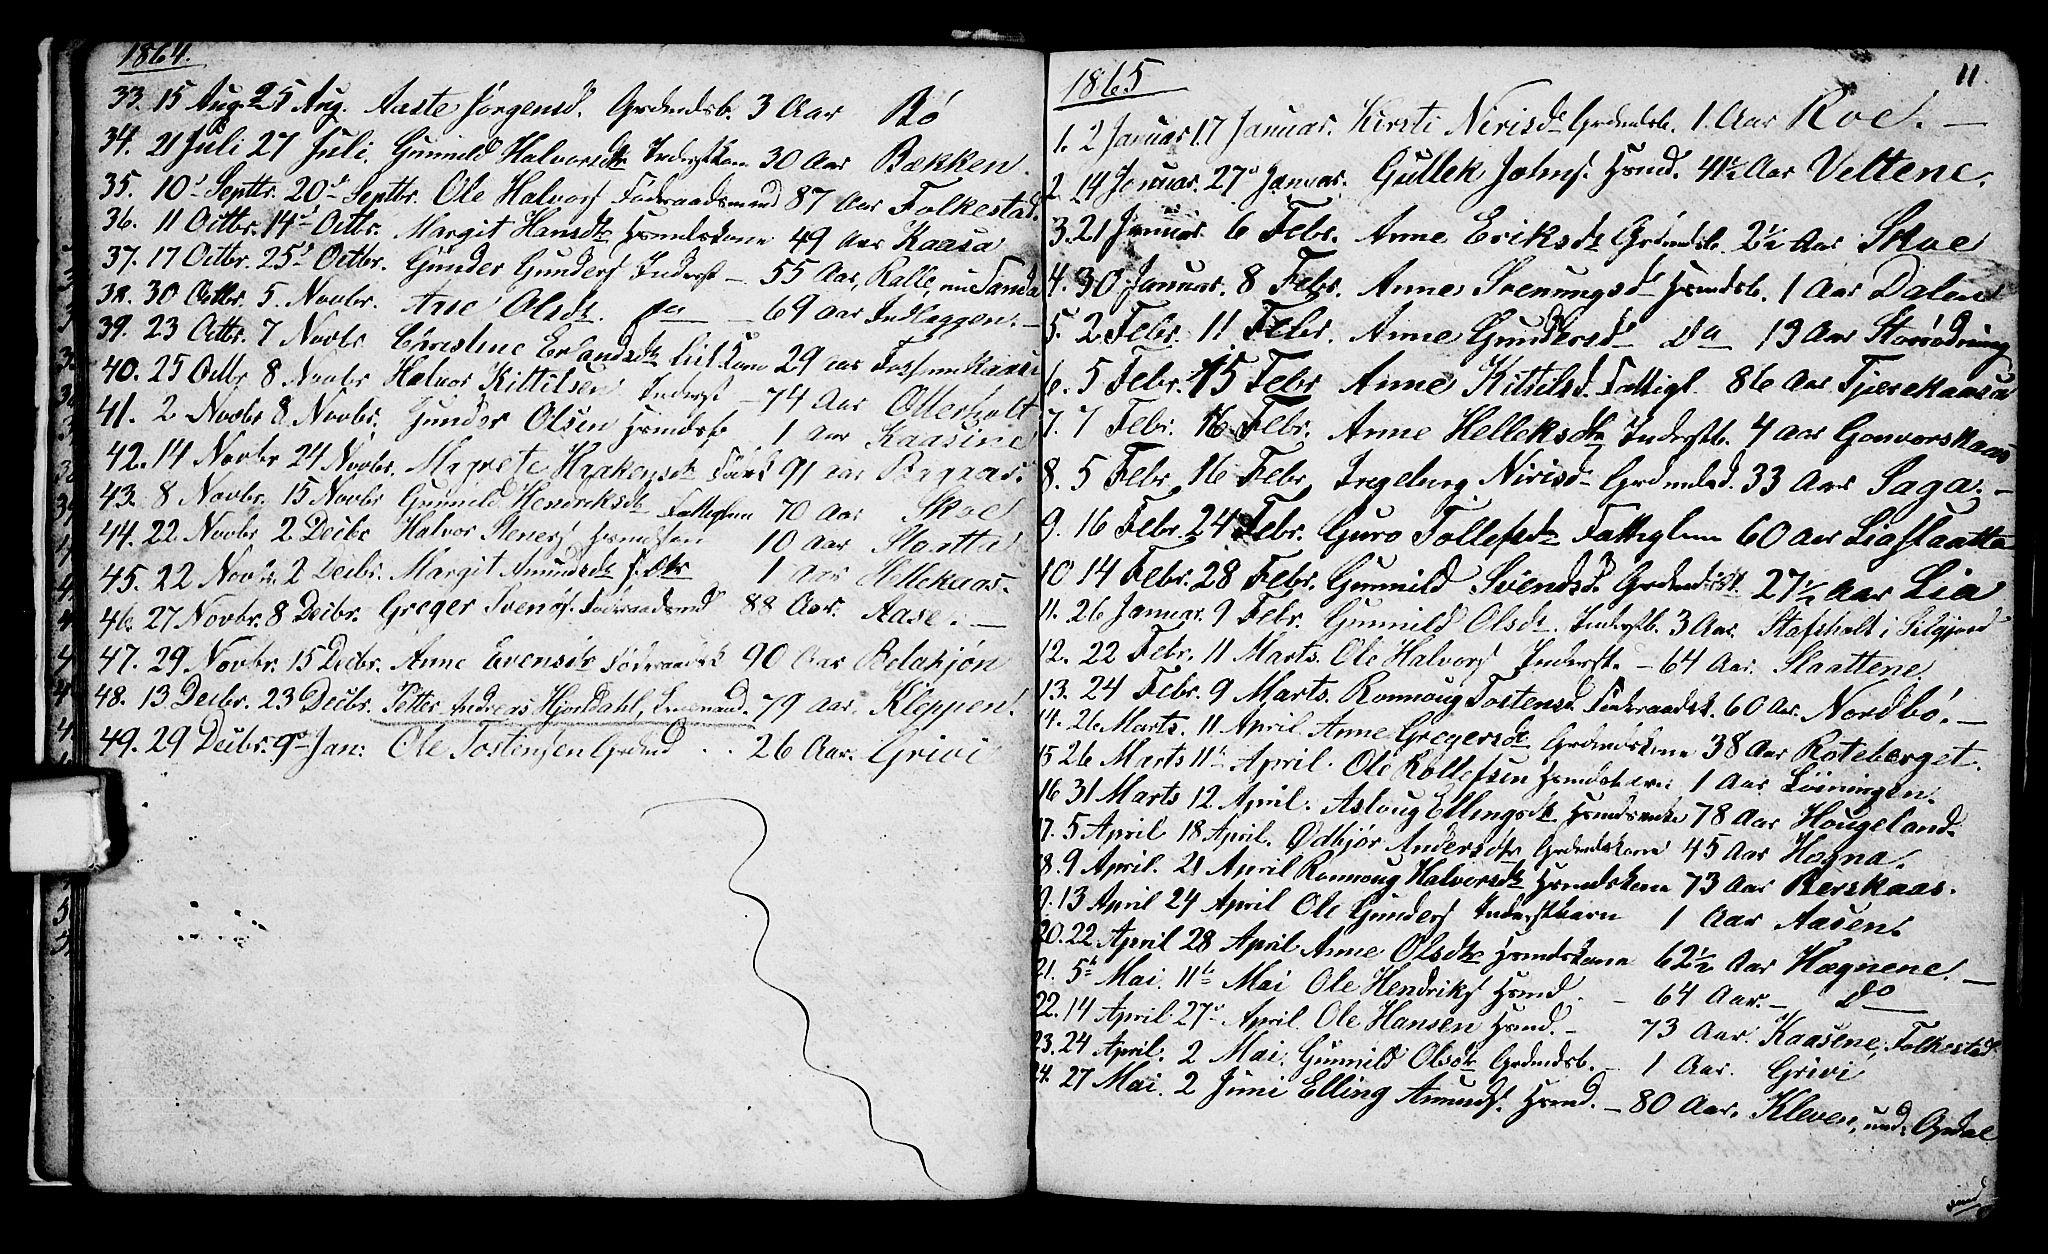 SAKO, Bø kirkebøker, G/Ga/L0002: Klokkerbok nr. 2, 1853-1866, s. 11